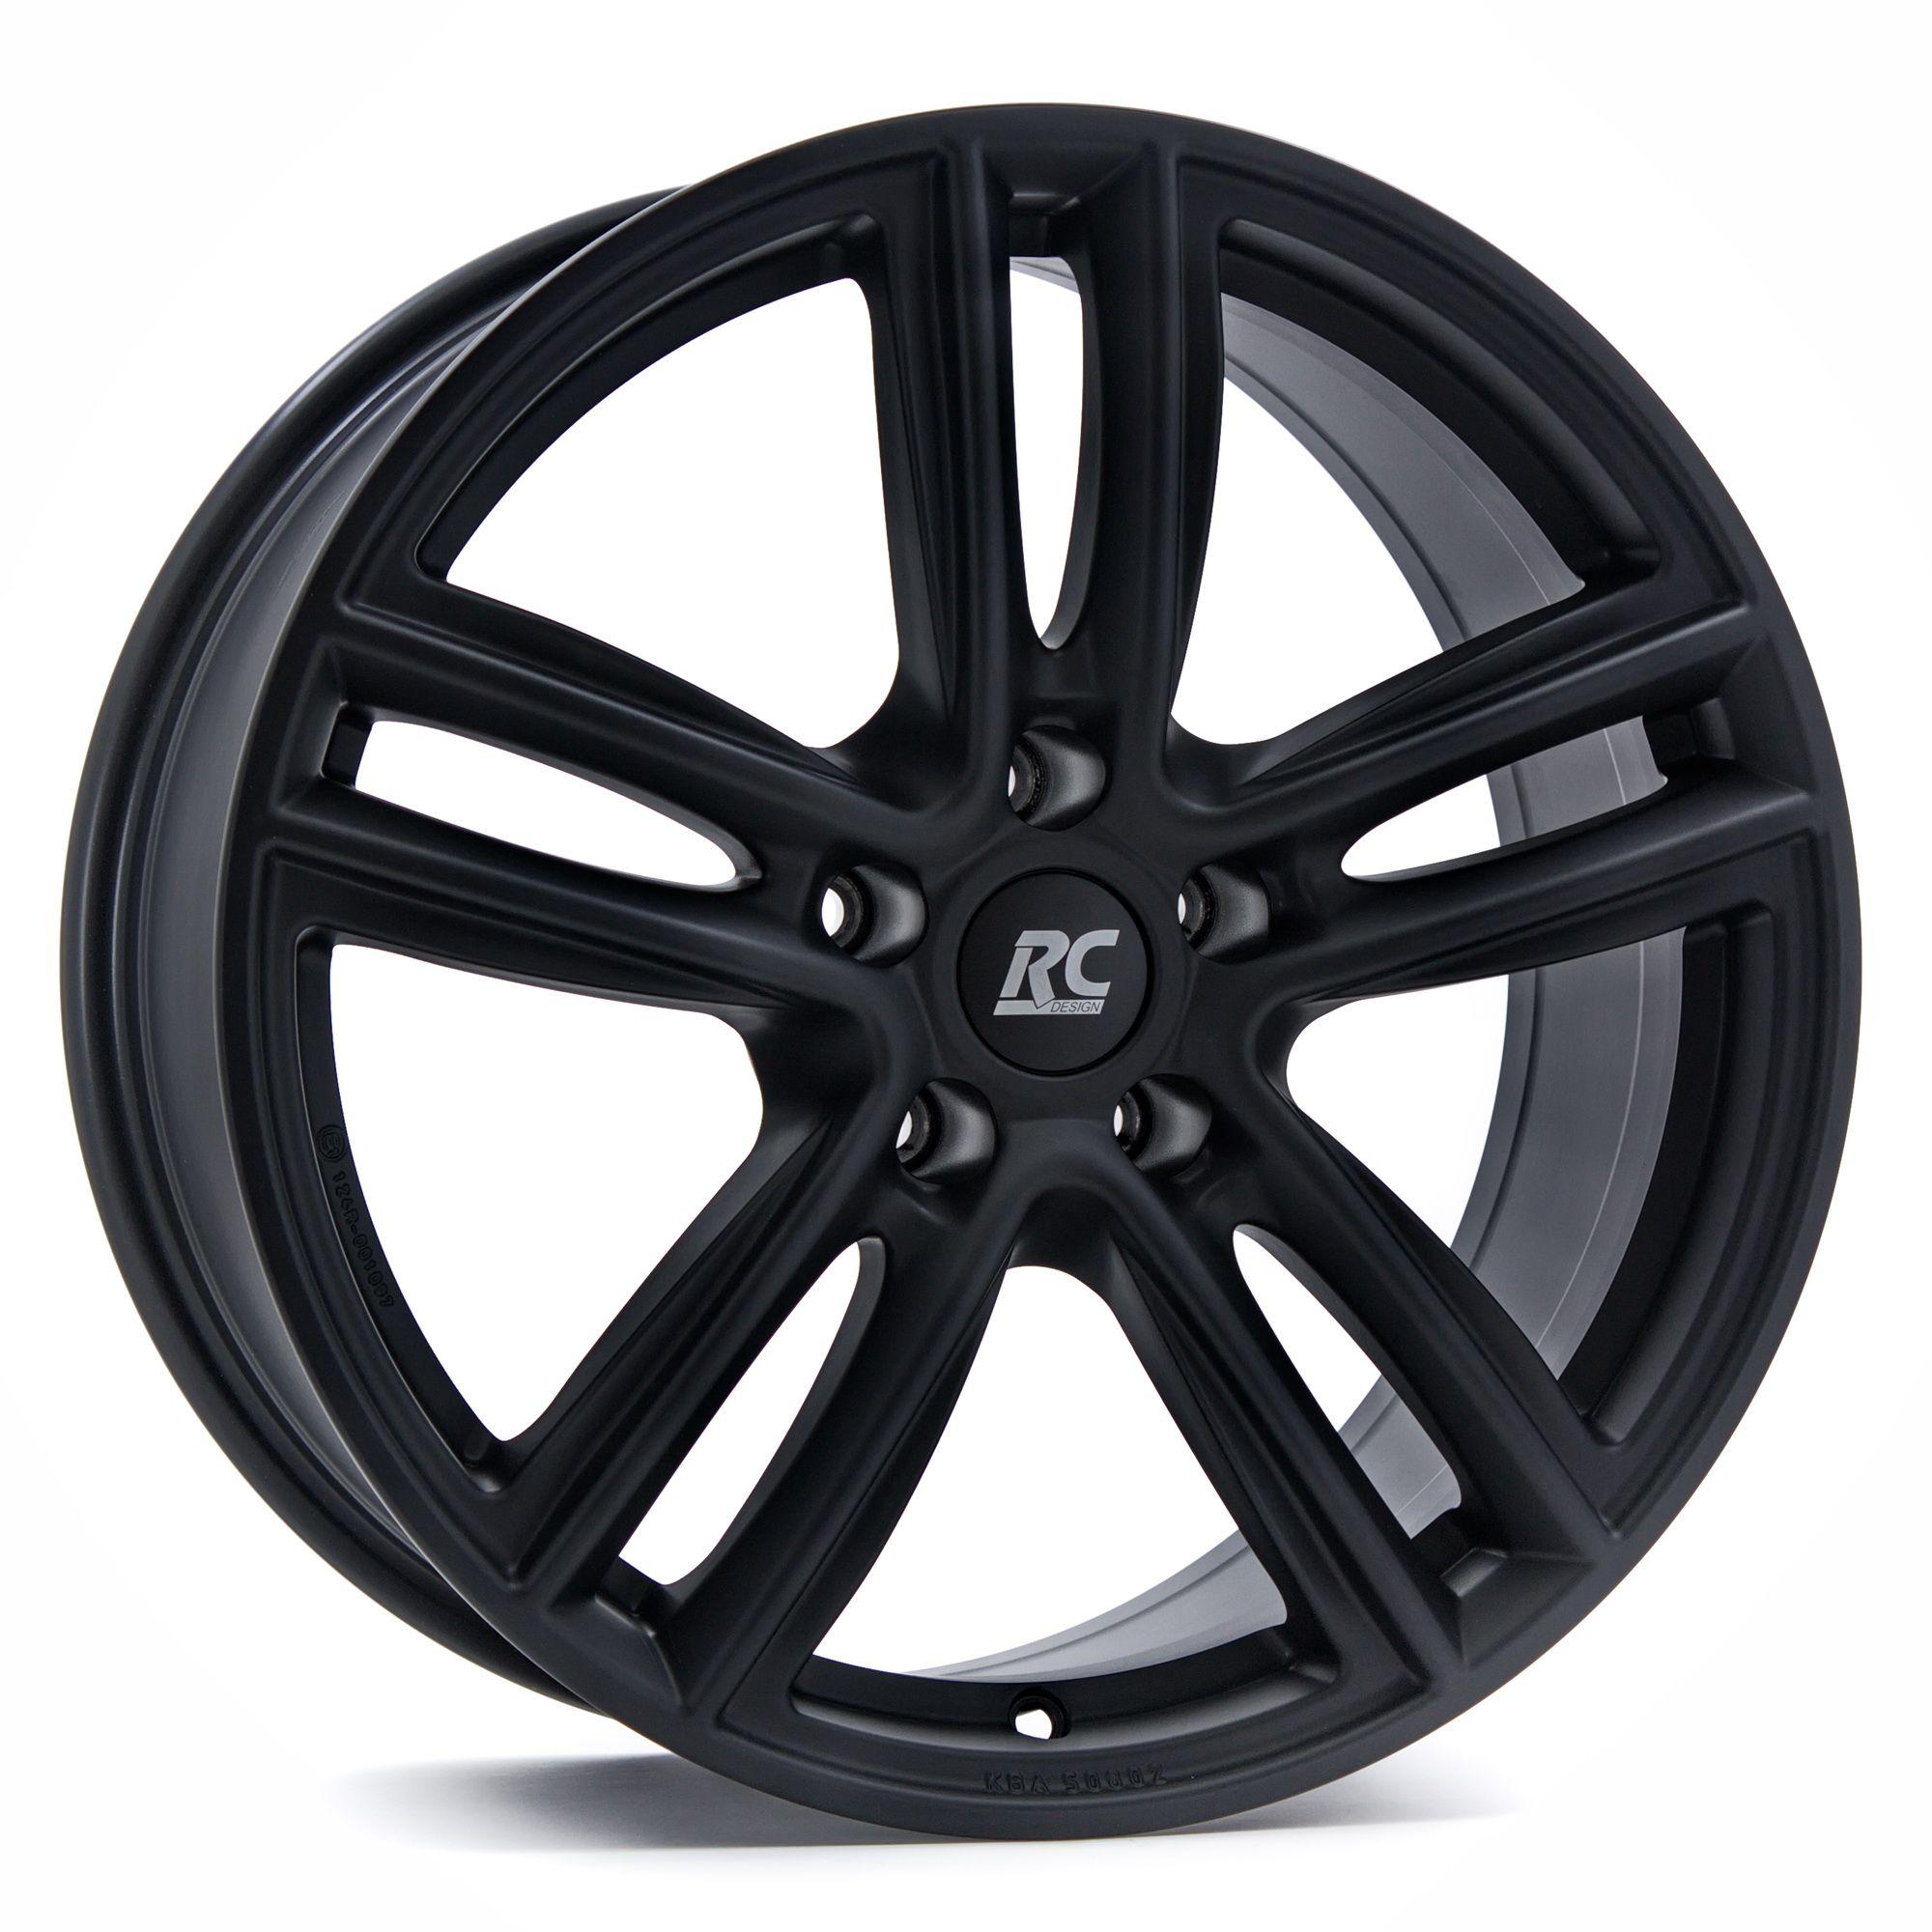 rc design rc27 felgen schwarz matt lackiert in 16 zoll. Black Bedroom Furniture Sets. Home Design Ideas